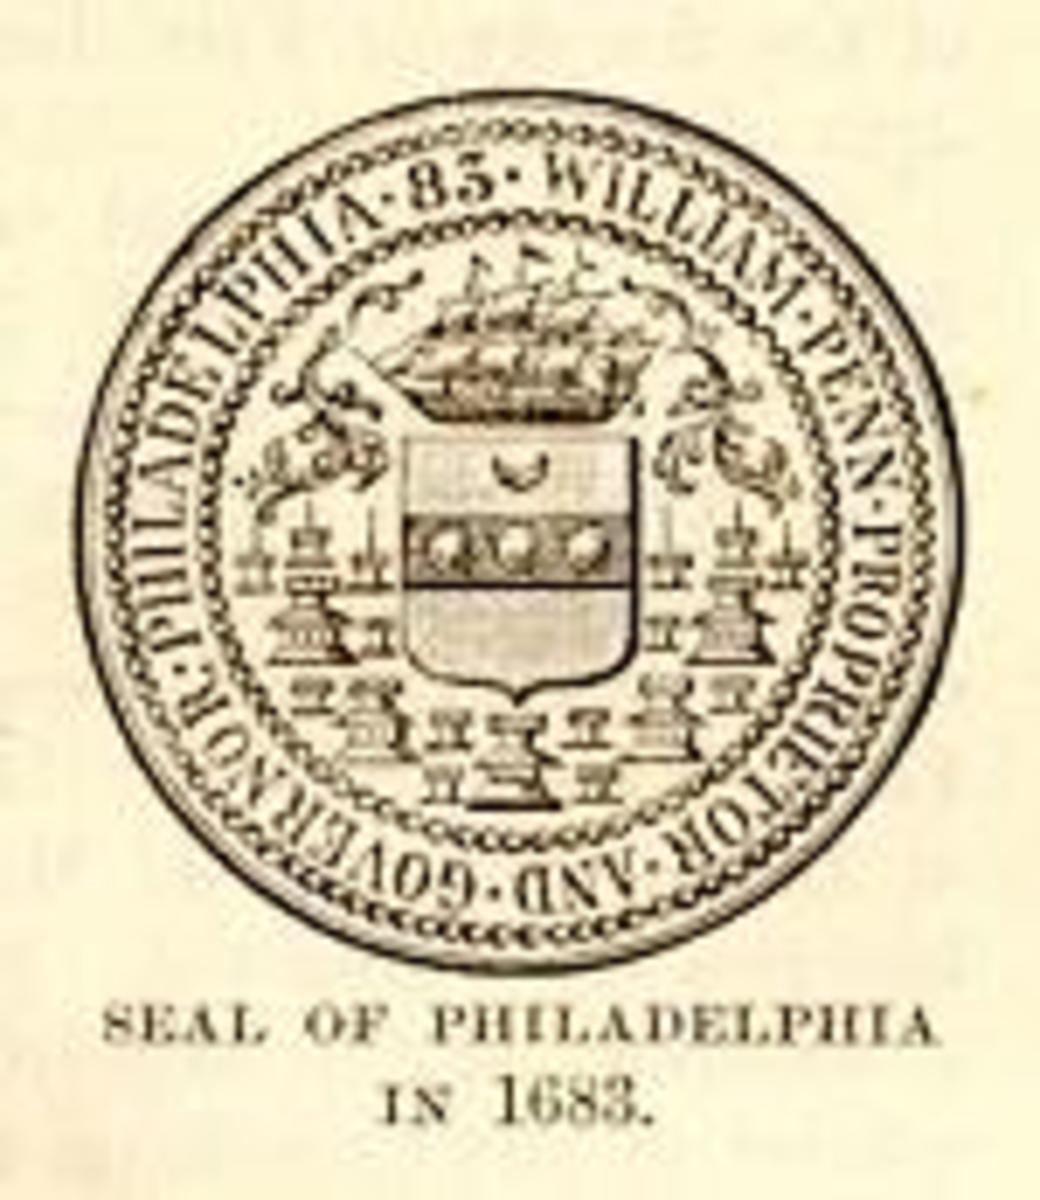 Located in Philadelphia (public domain image). Best nurse's training program in America for Adult and Pediatric Nursing.